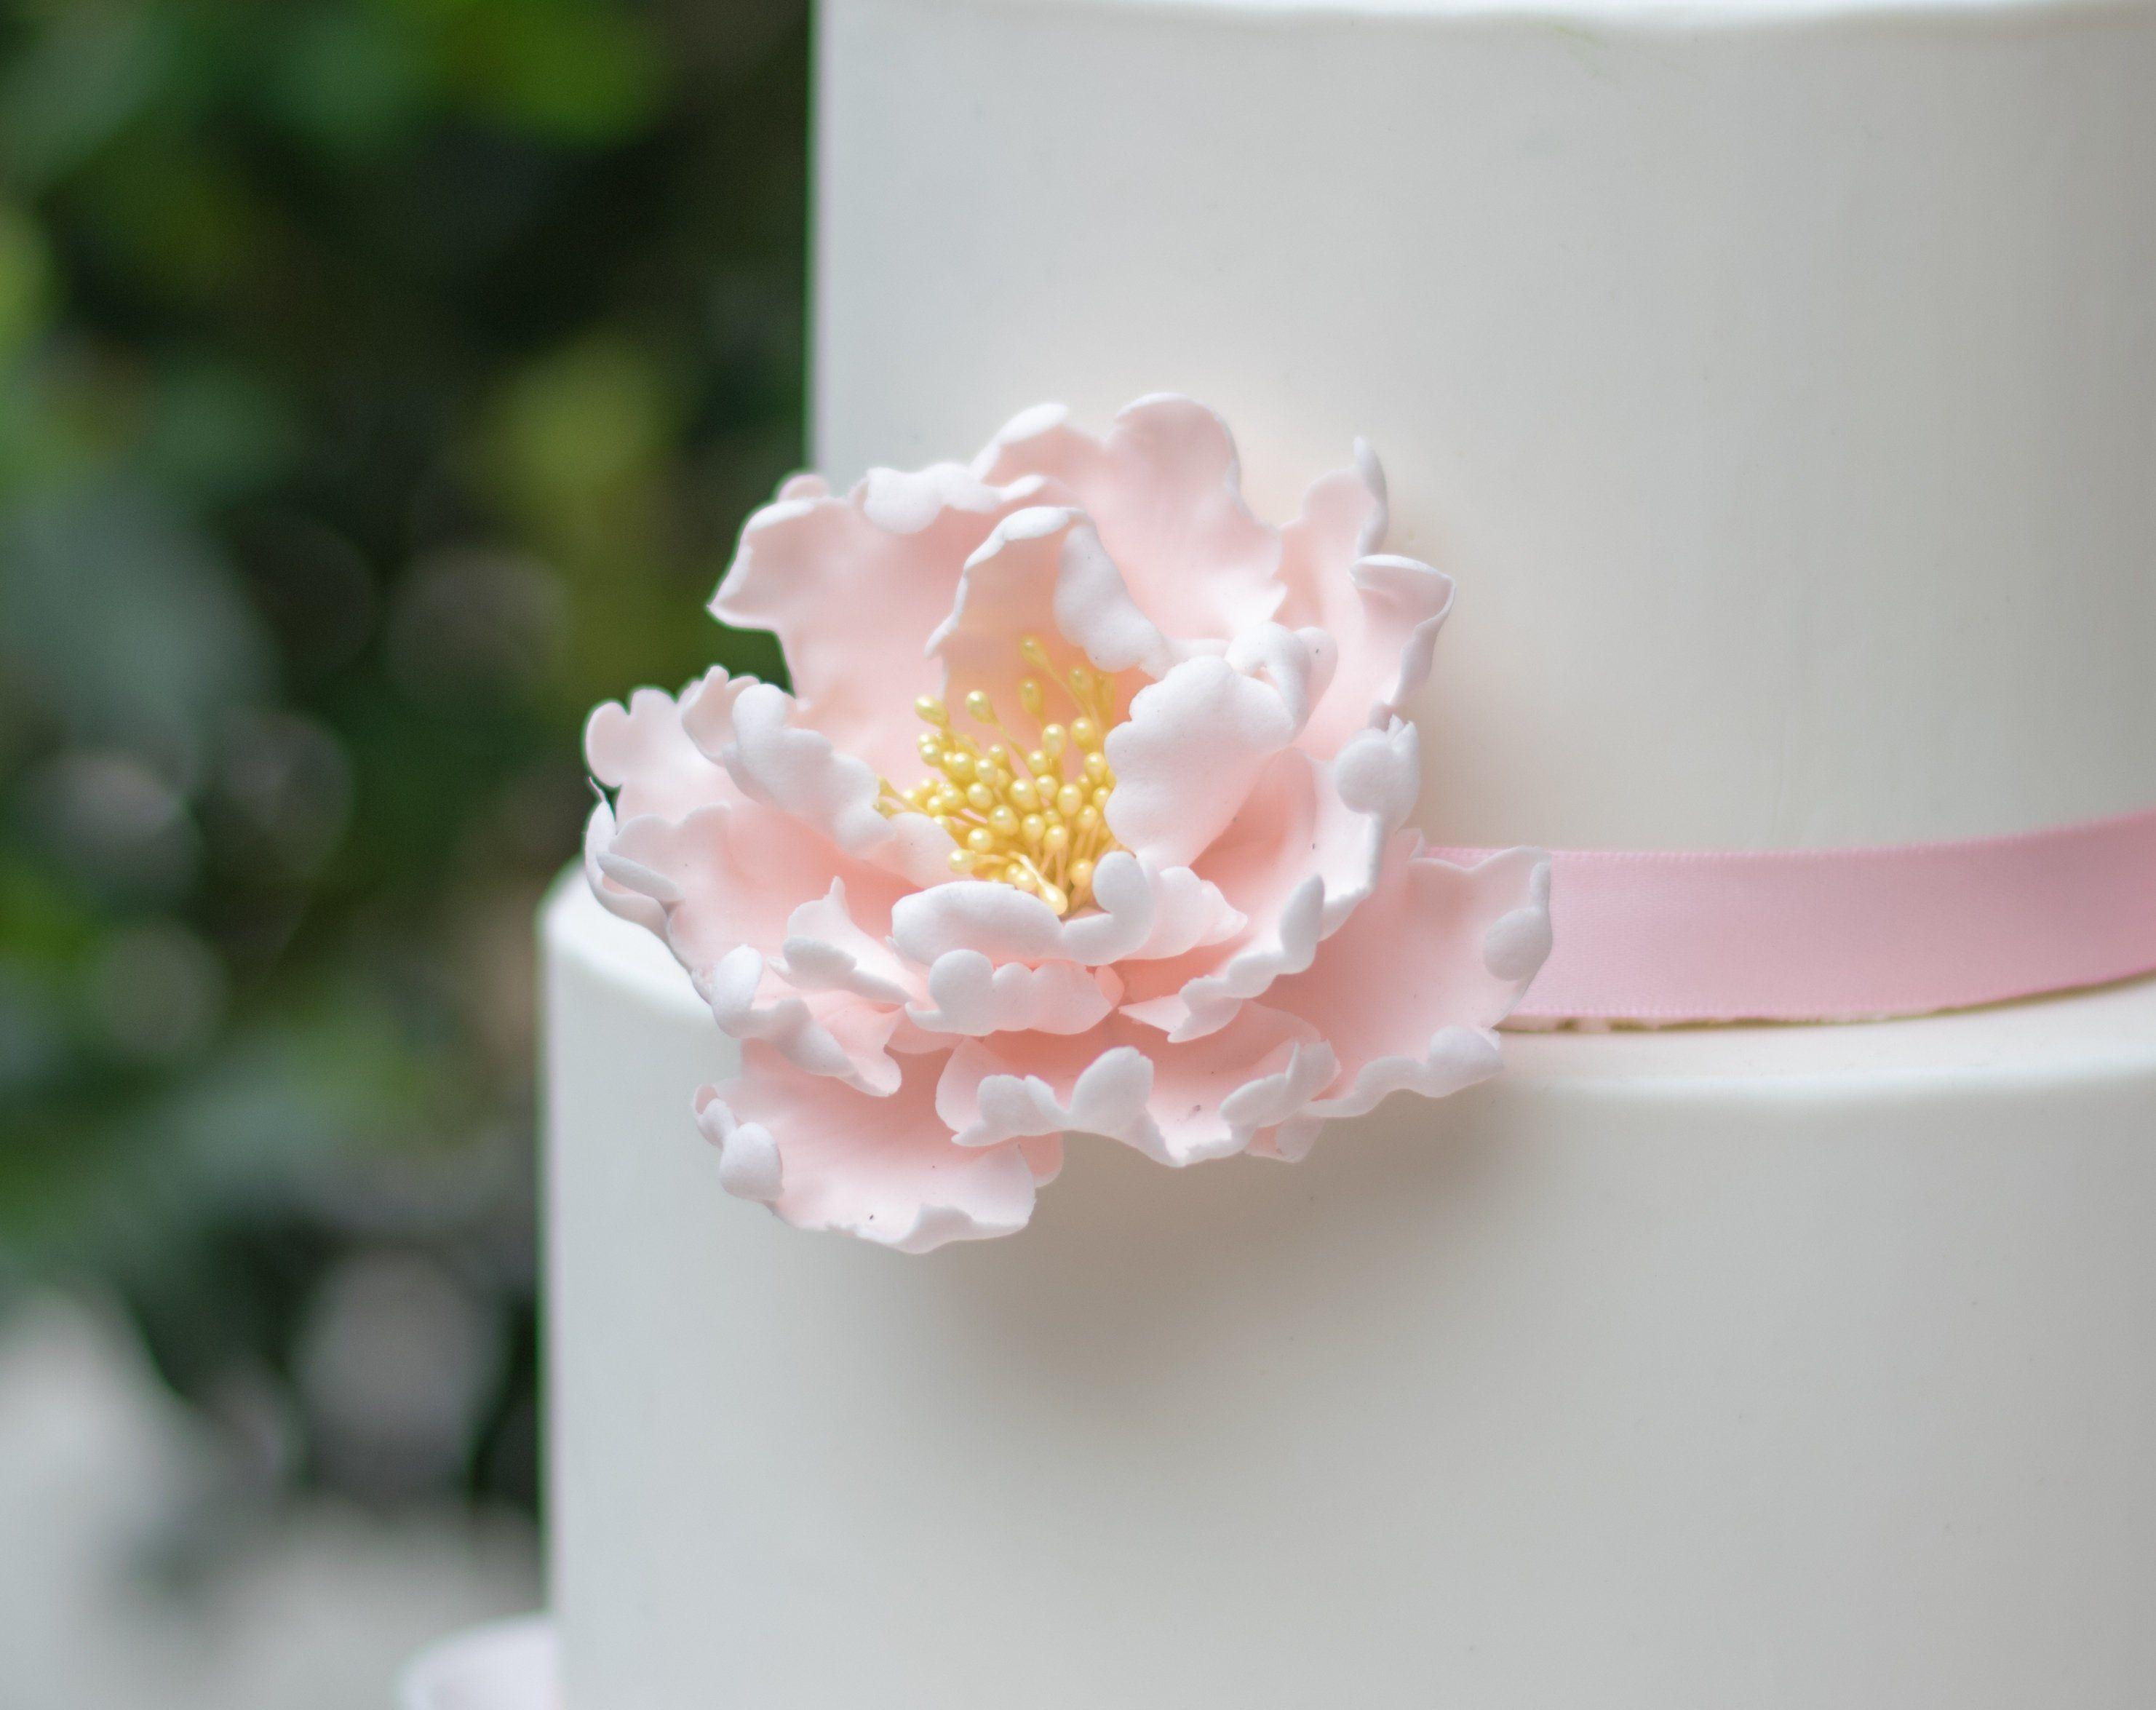 Blush Peony Sugar Flower Unique Wedding Cake Topper Gumpaste Flowers Stamens In Gold Silver Ros Sugar Flowers Wedding Cake Toppers Unique Blush Peonies